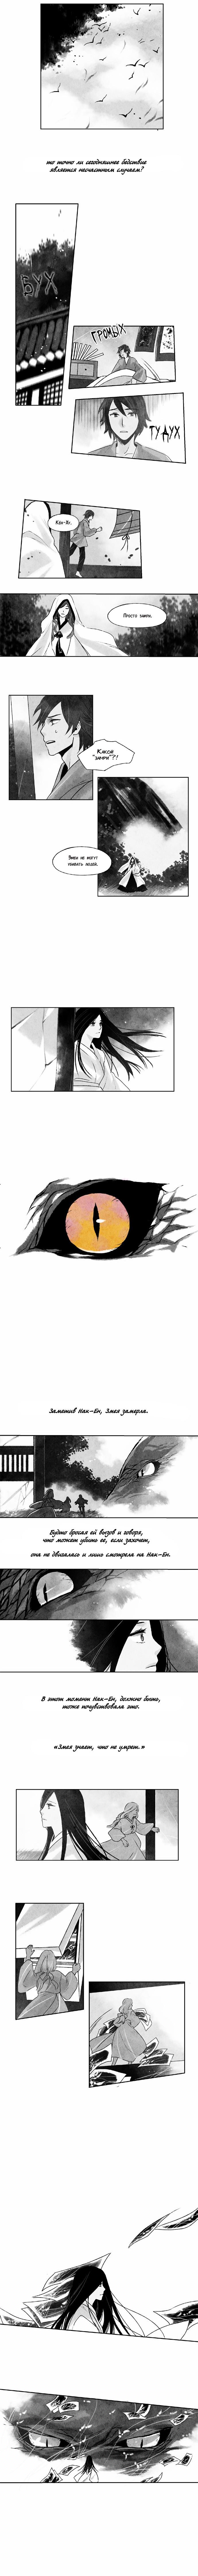 https://r1.ninemanga.com/comics/pic2/39/22503/416369/153288423433.jpg Page 3